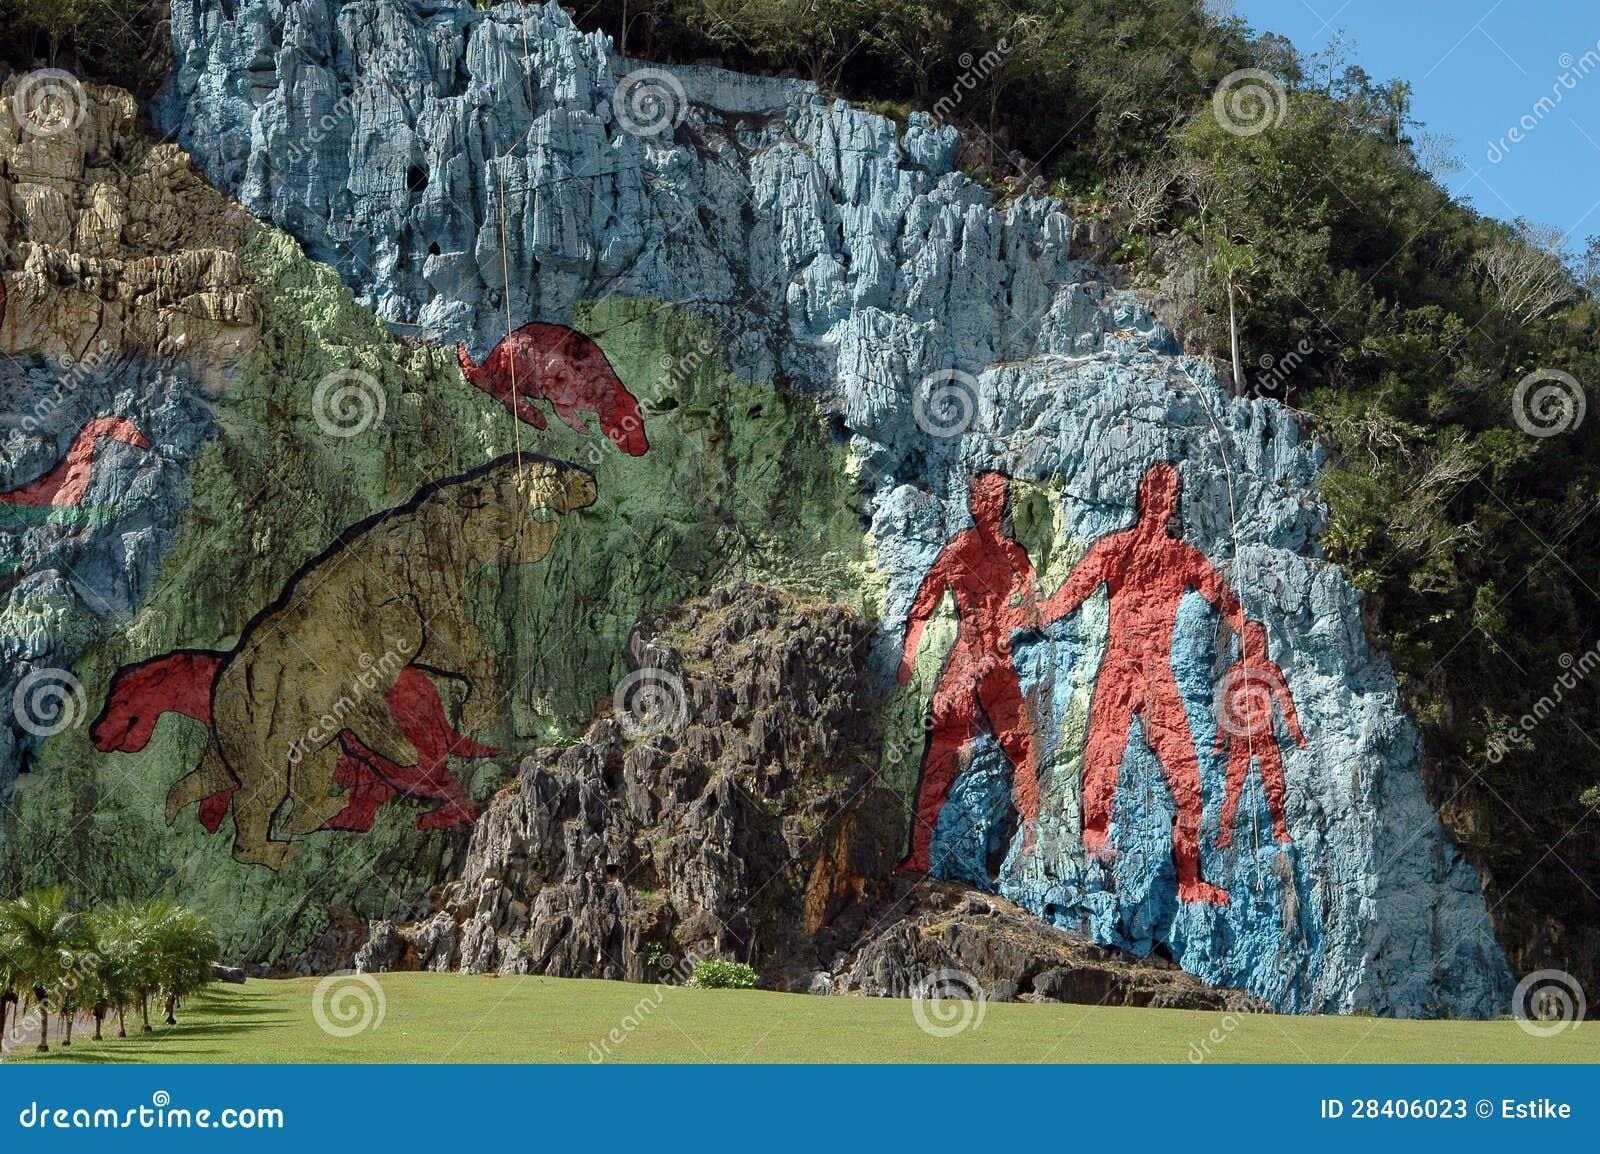 Mural de la prehistoria stock photos image 28406023 for Mural de la prehistoria